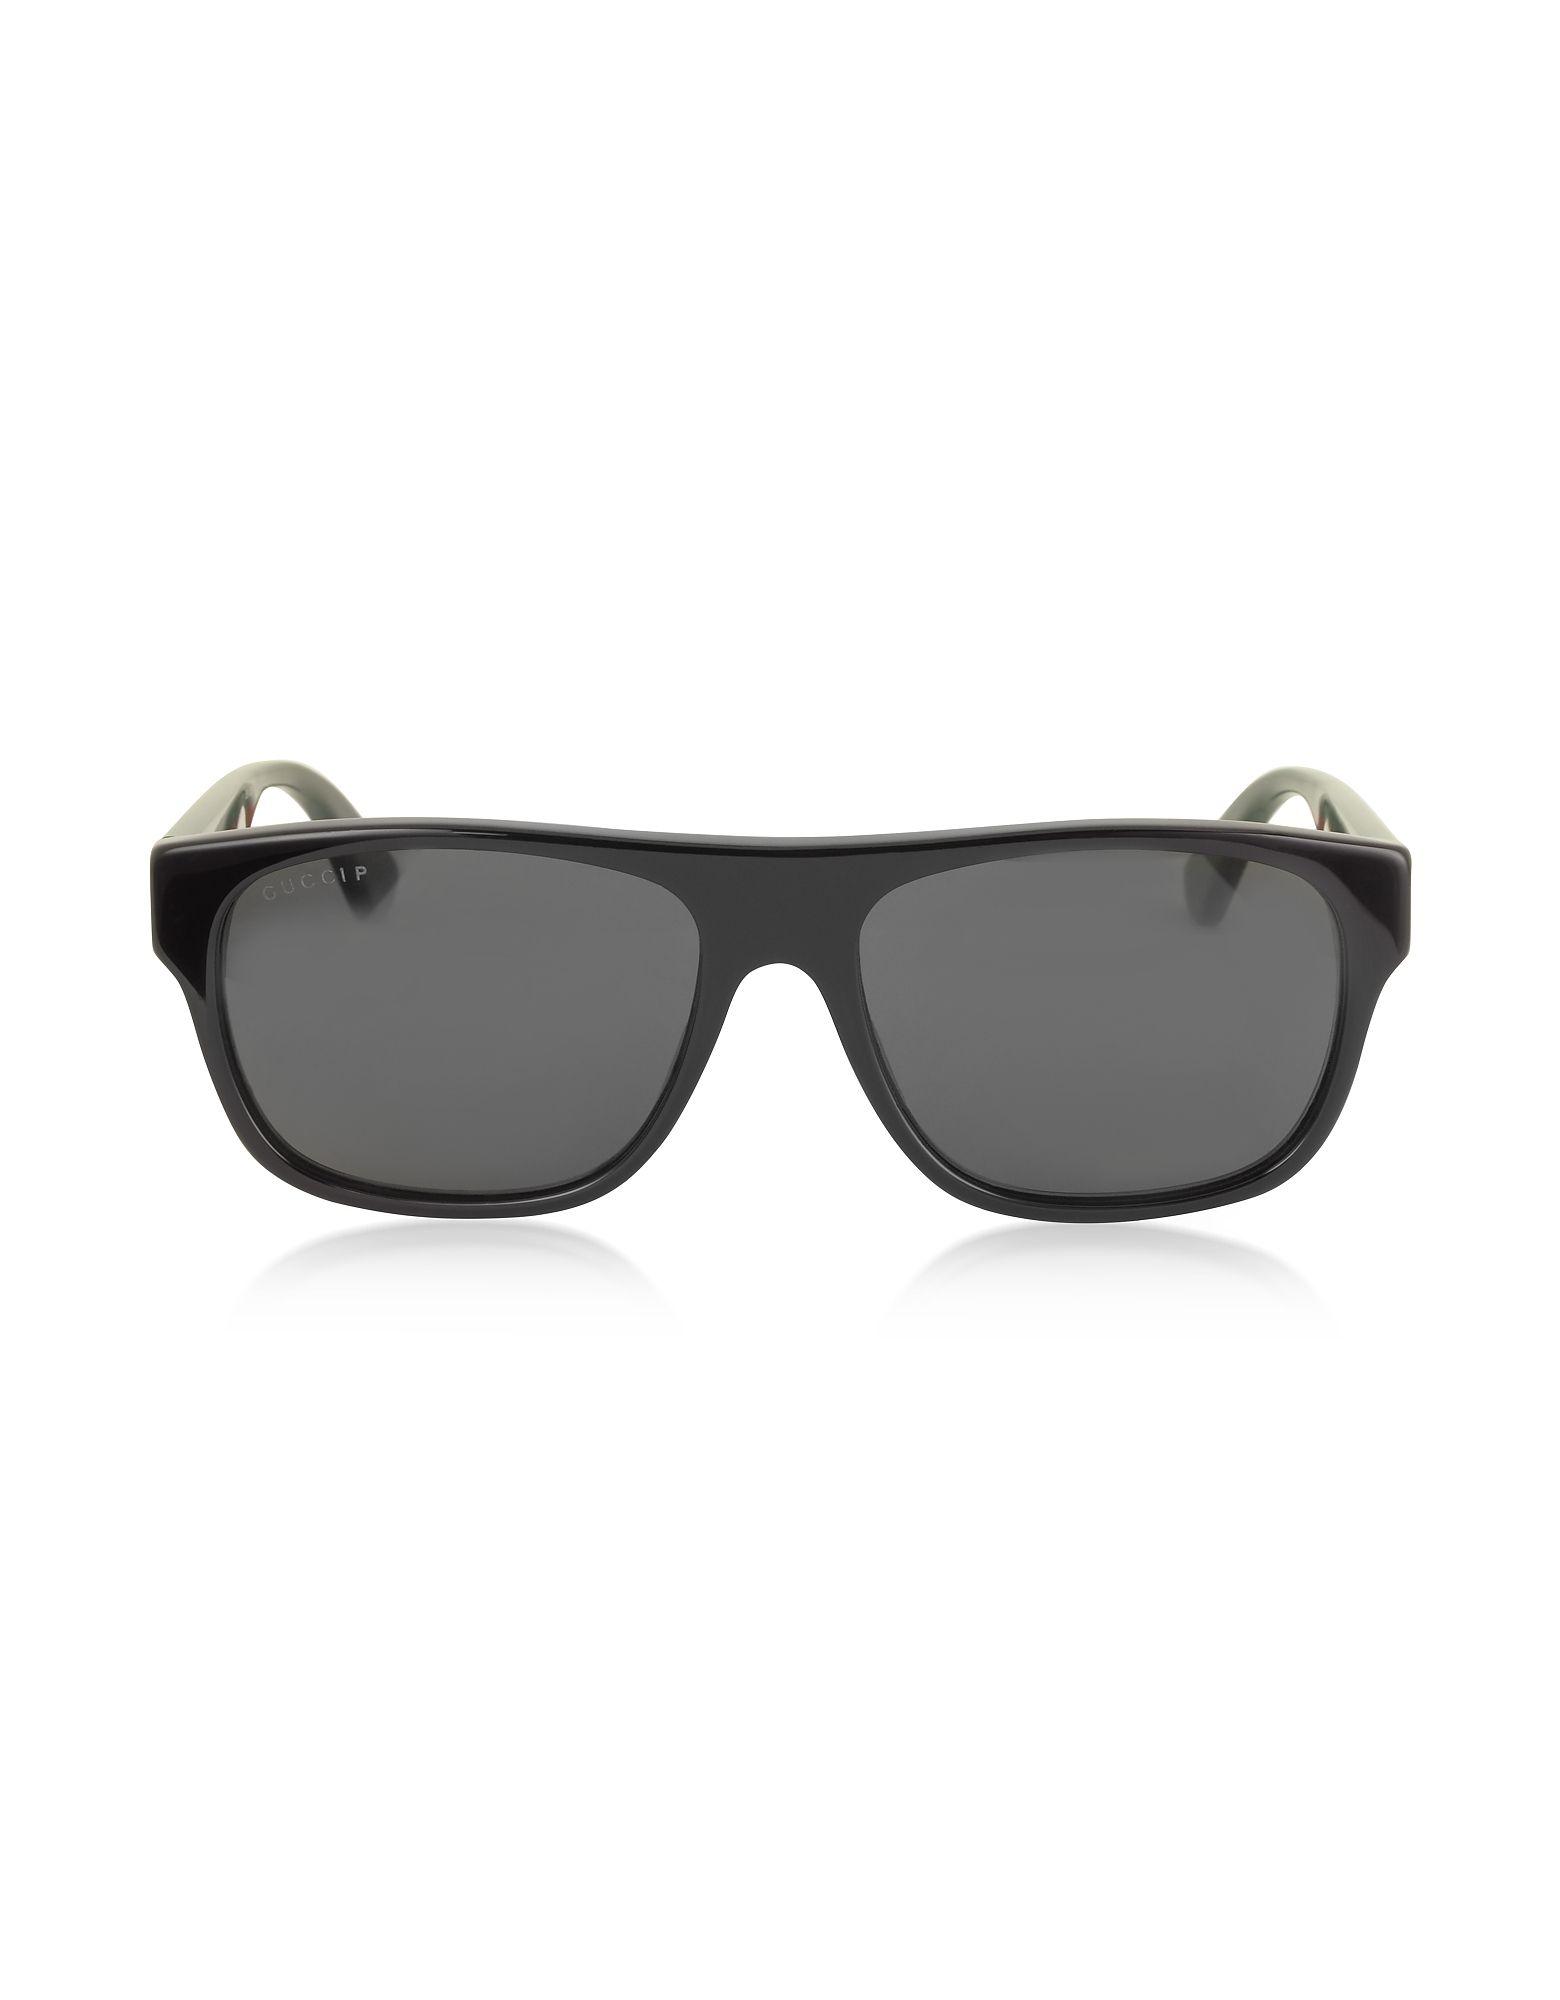 Gucci Men's Black Acetate Sunglasses